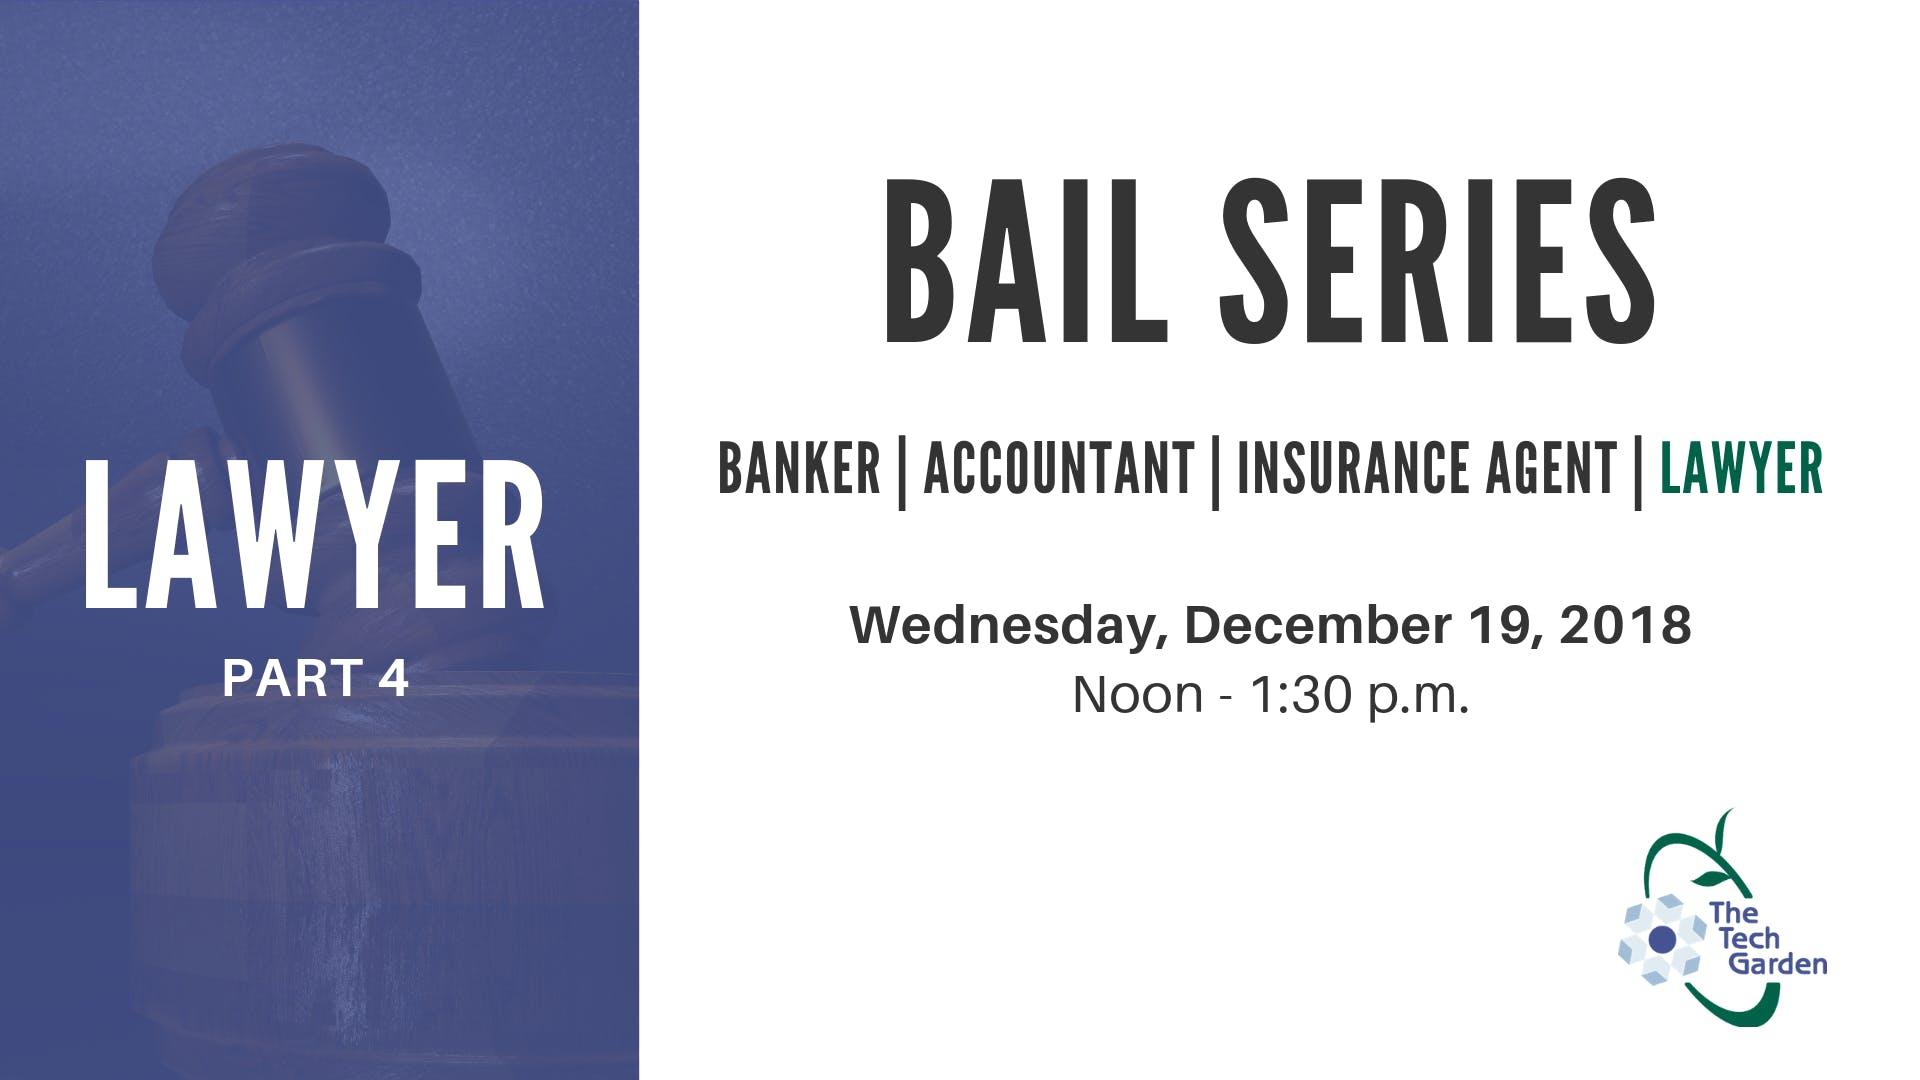 B.A.I.L Part 4 - Lawyer